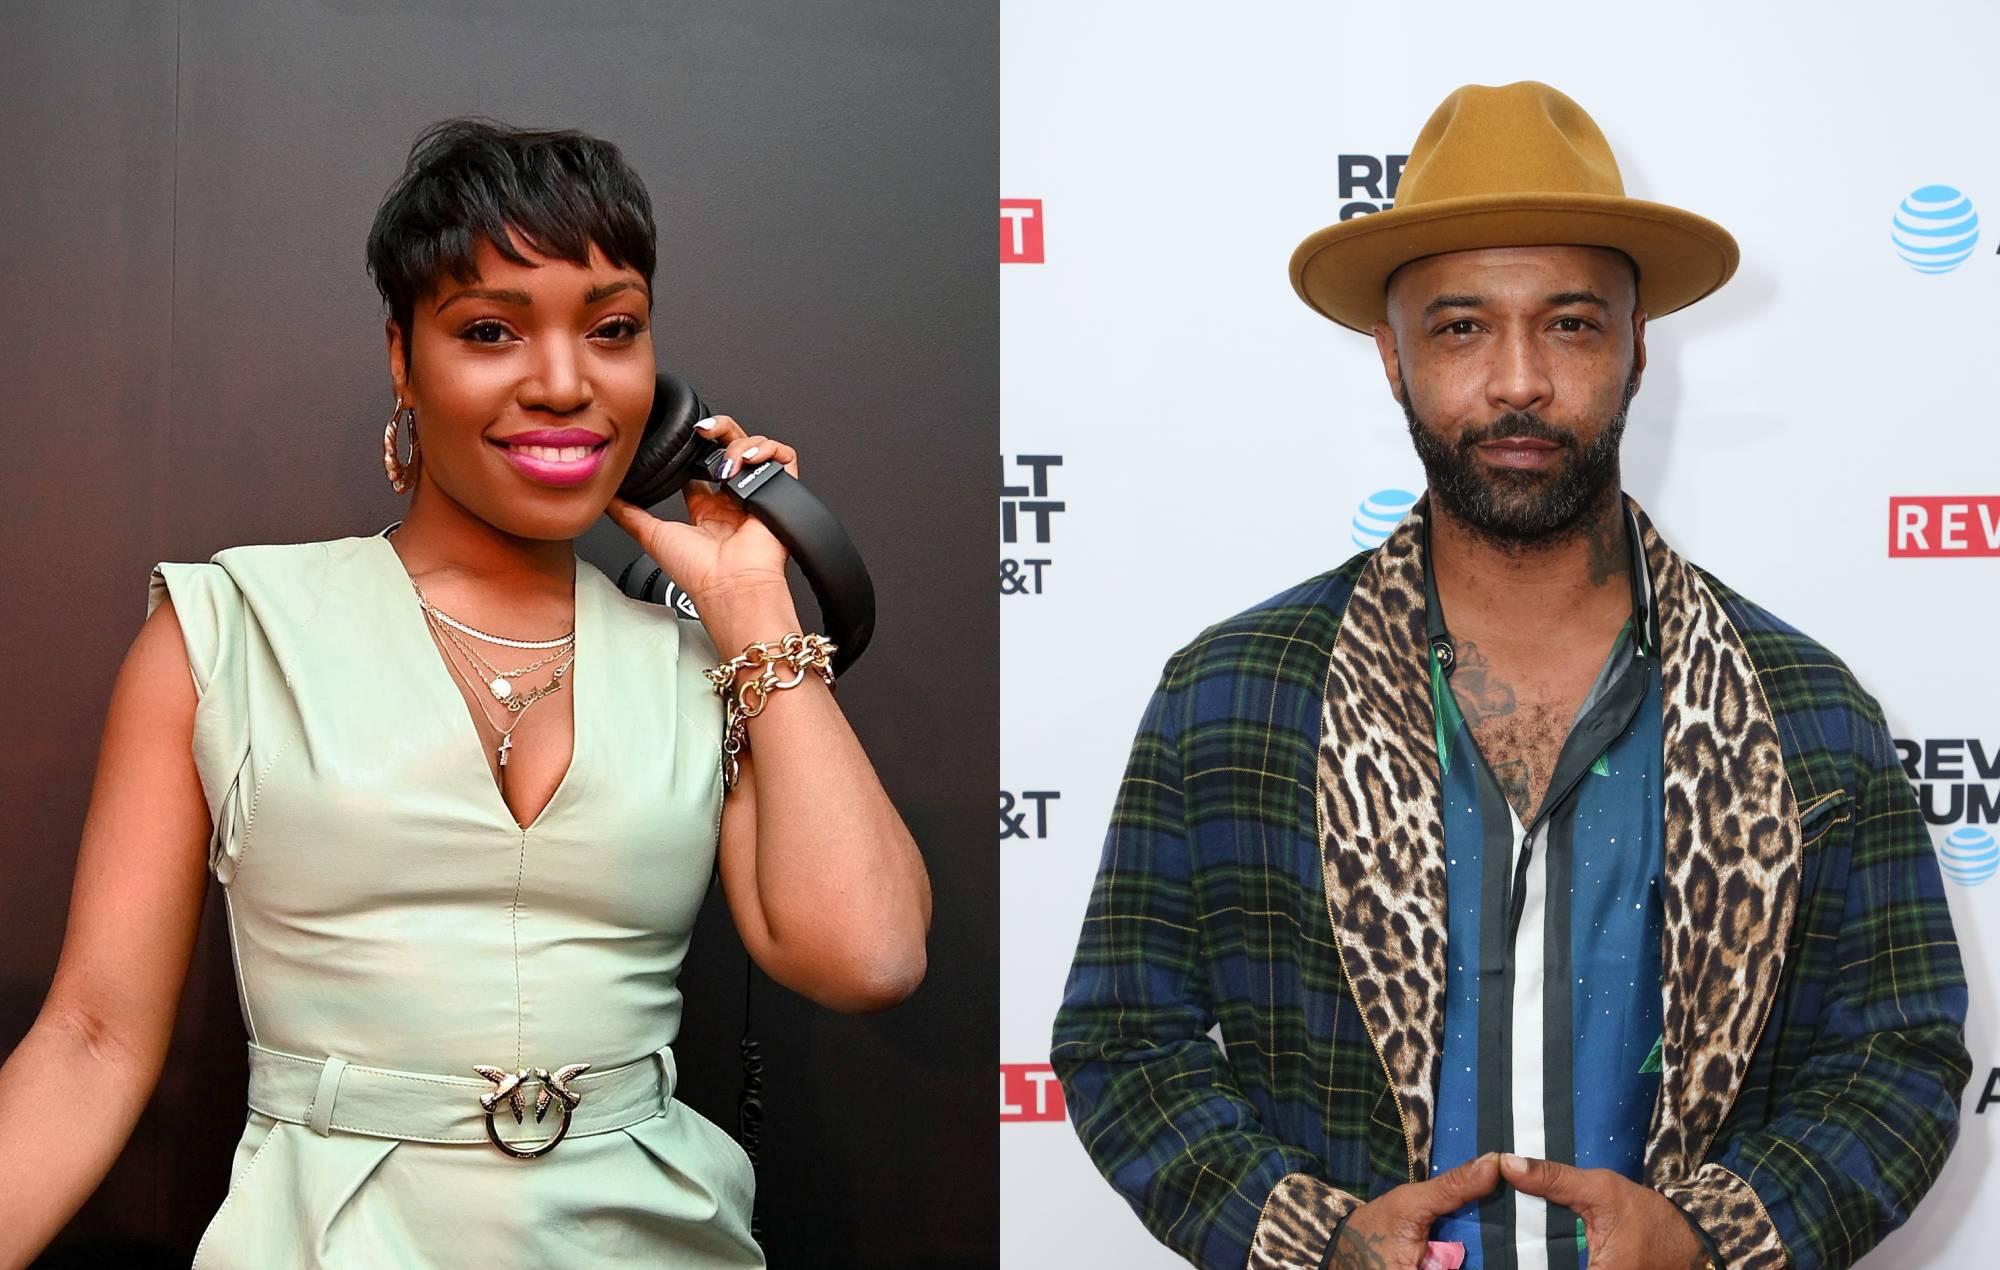 DJ Olivia Dope accuses Joe Budden of sexual harassment